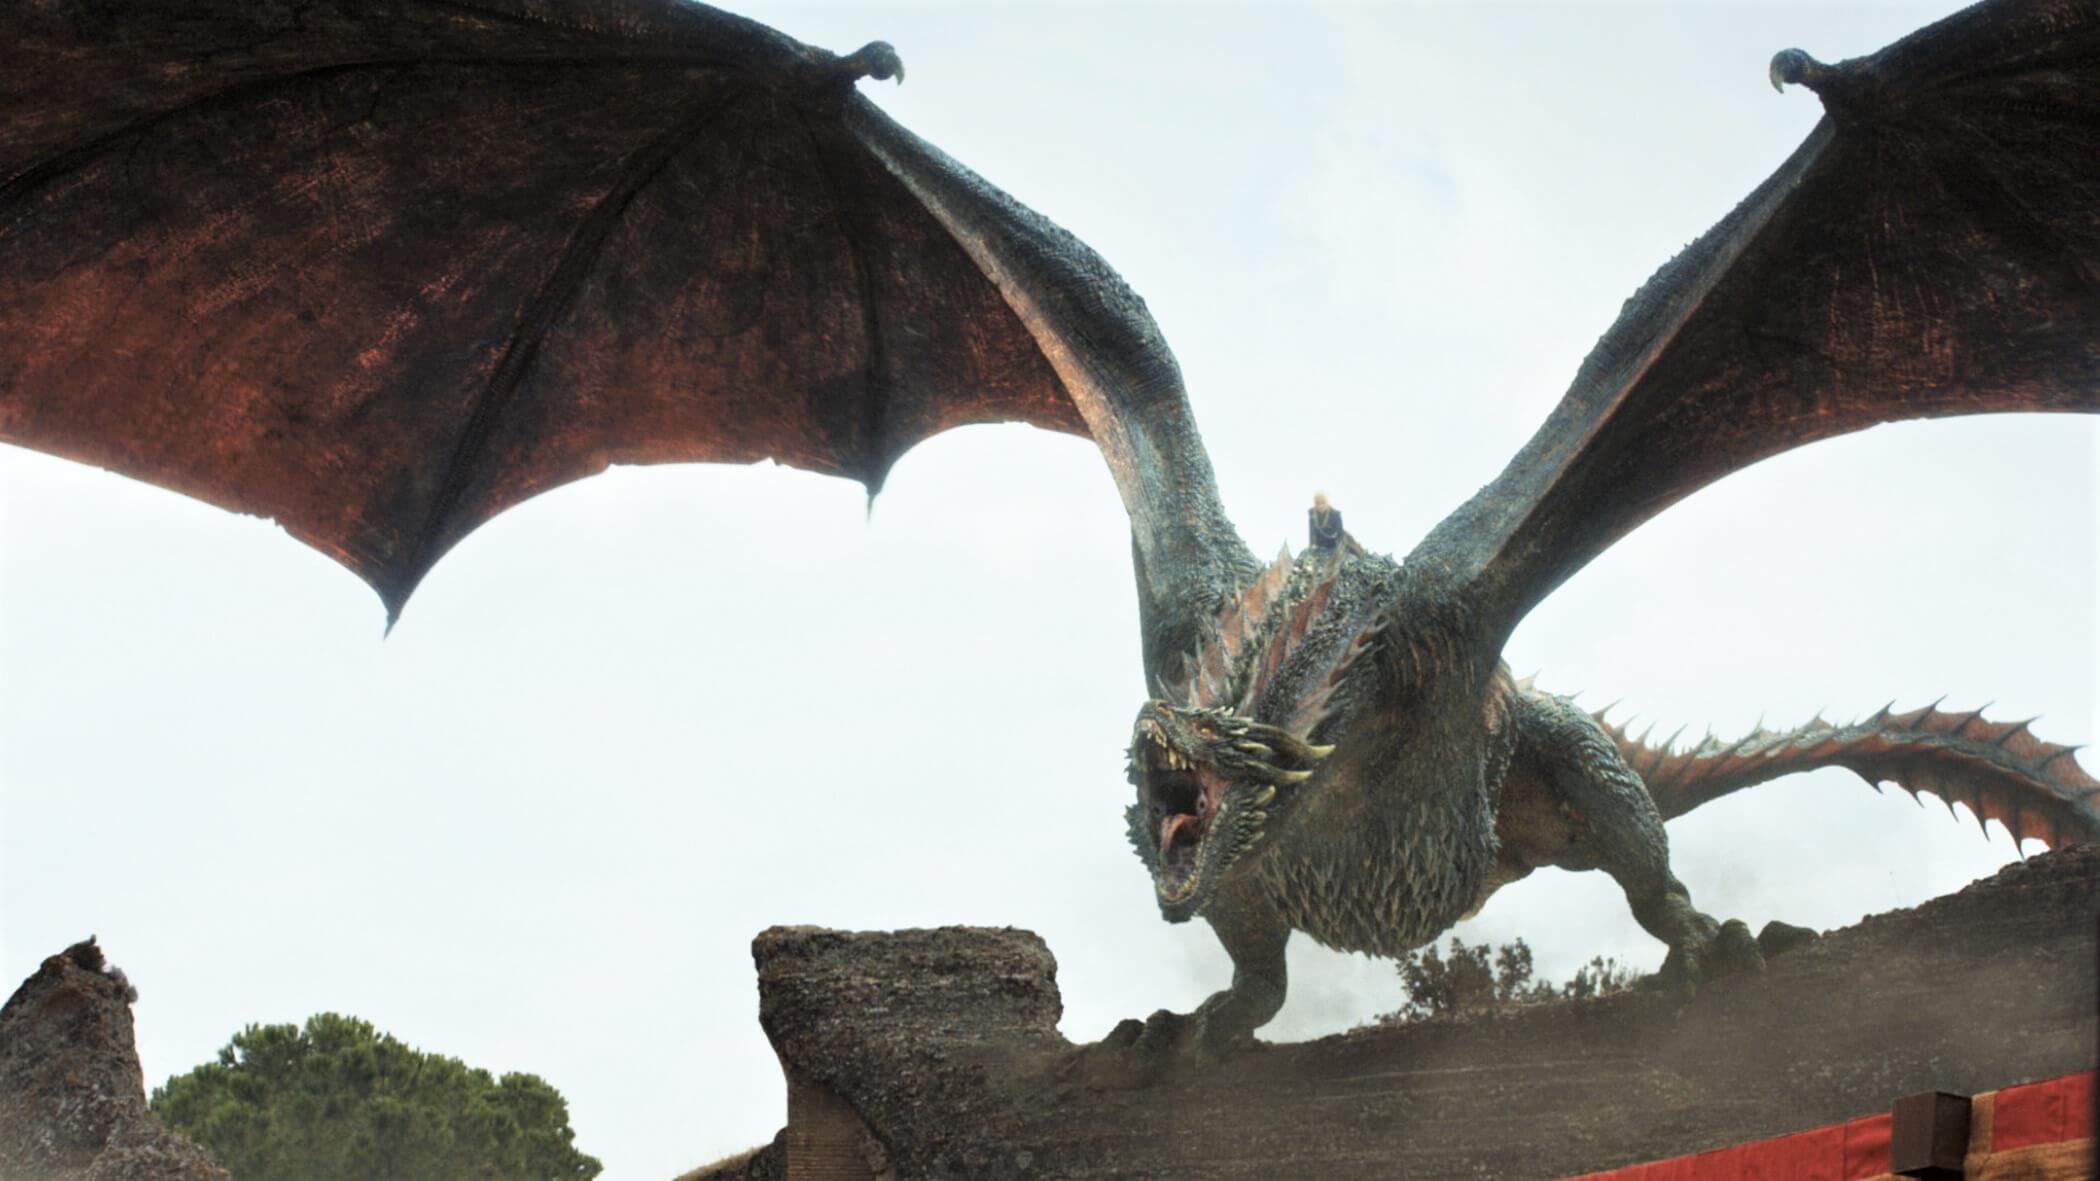 Rumeurs sur les spin-offs de Game of Thrones : tournage en octobre et préquel Valyria